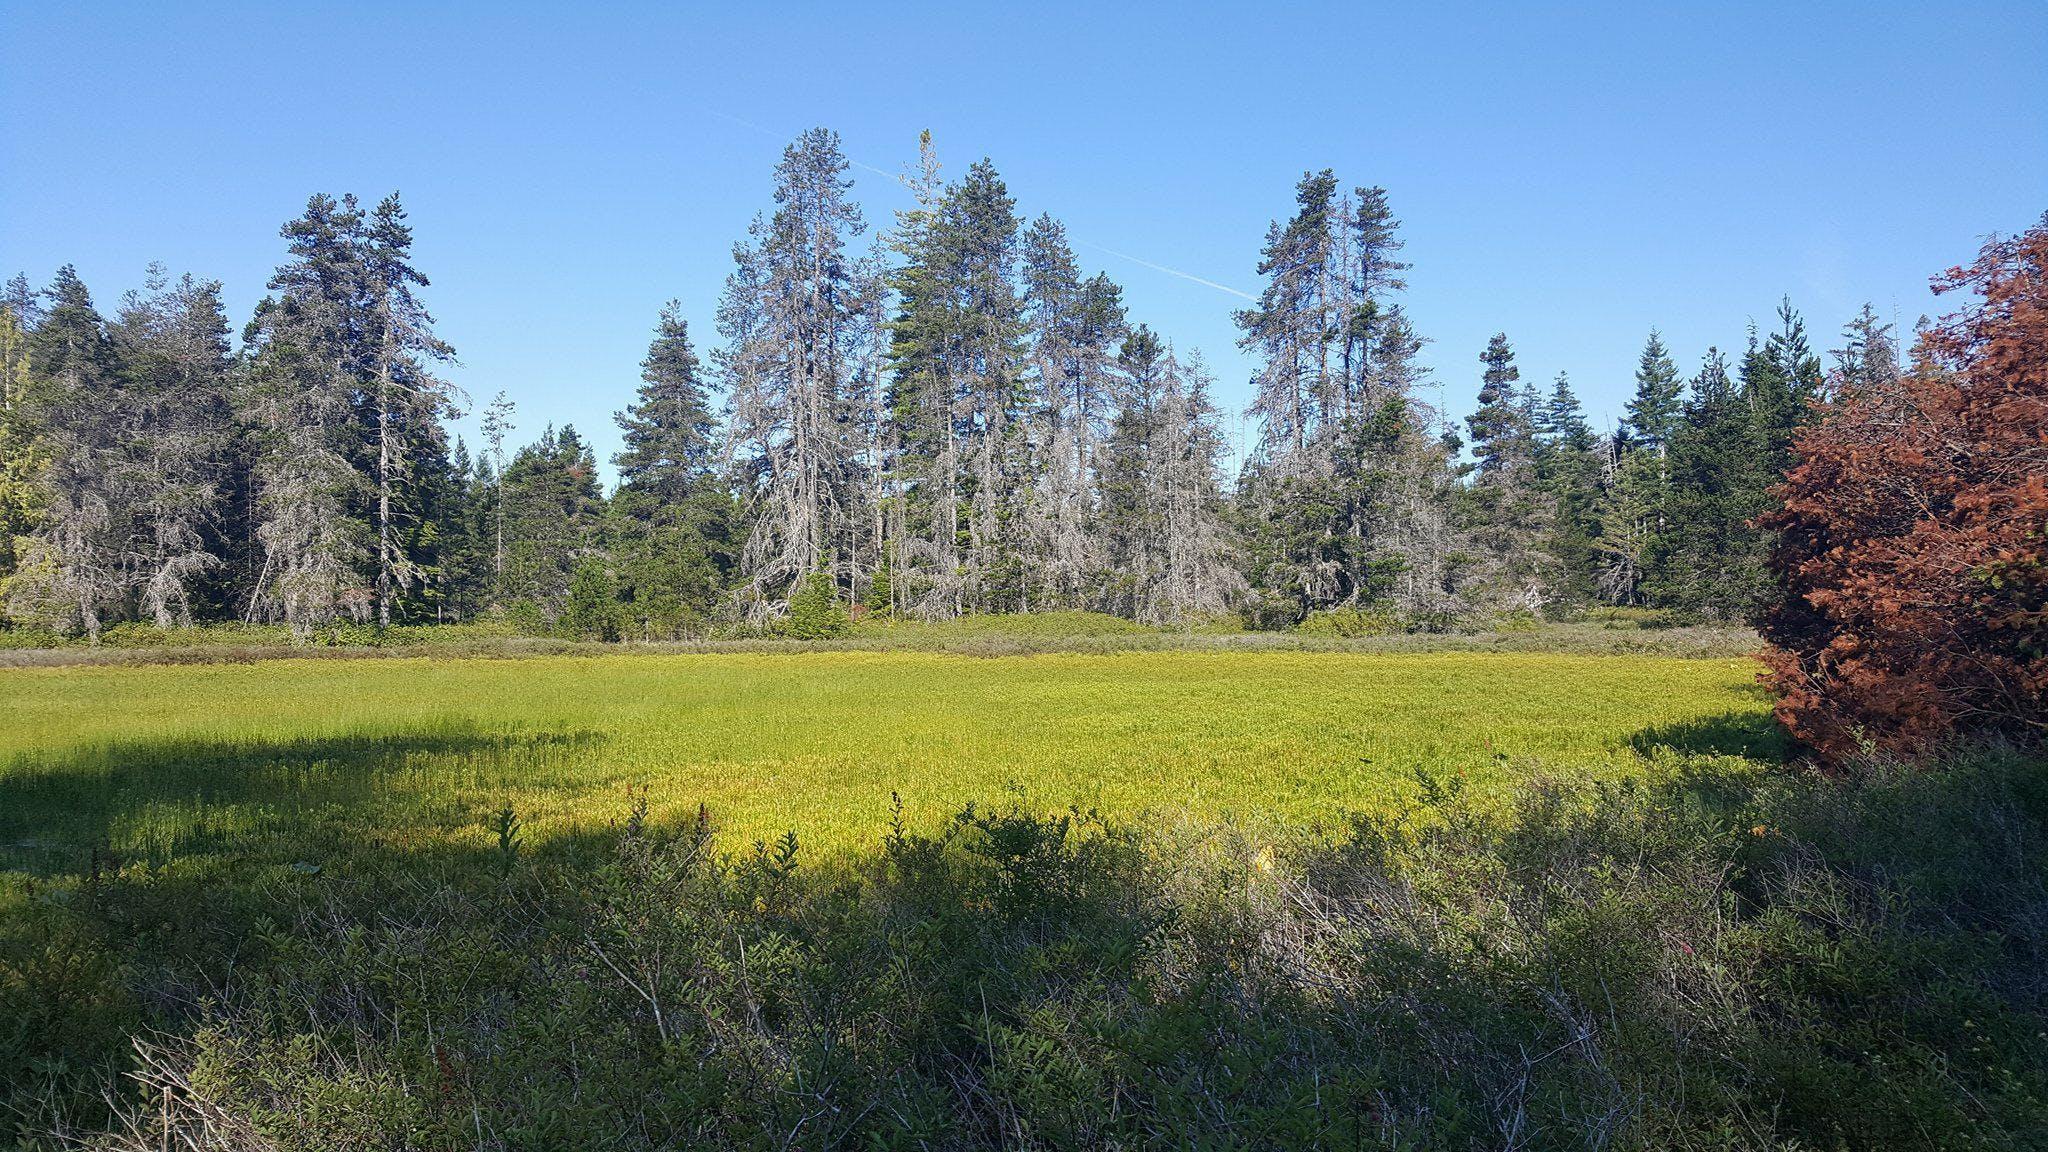 Wetland in the Big Qualicum Water Region